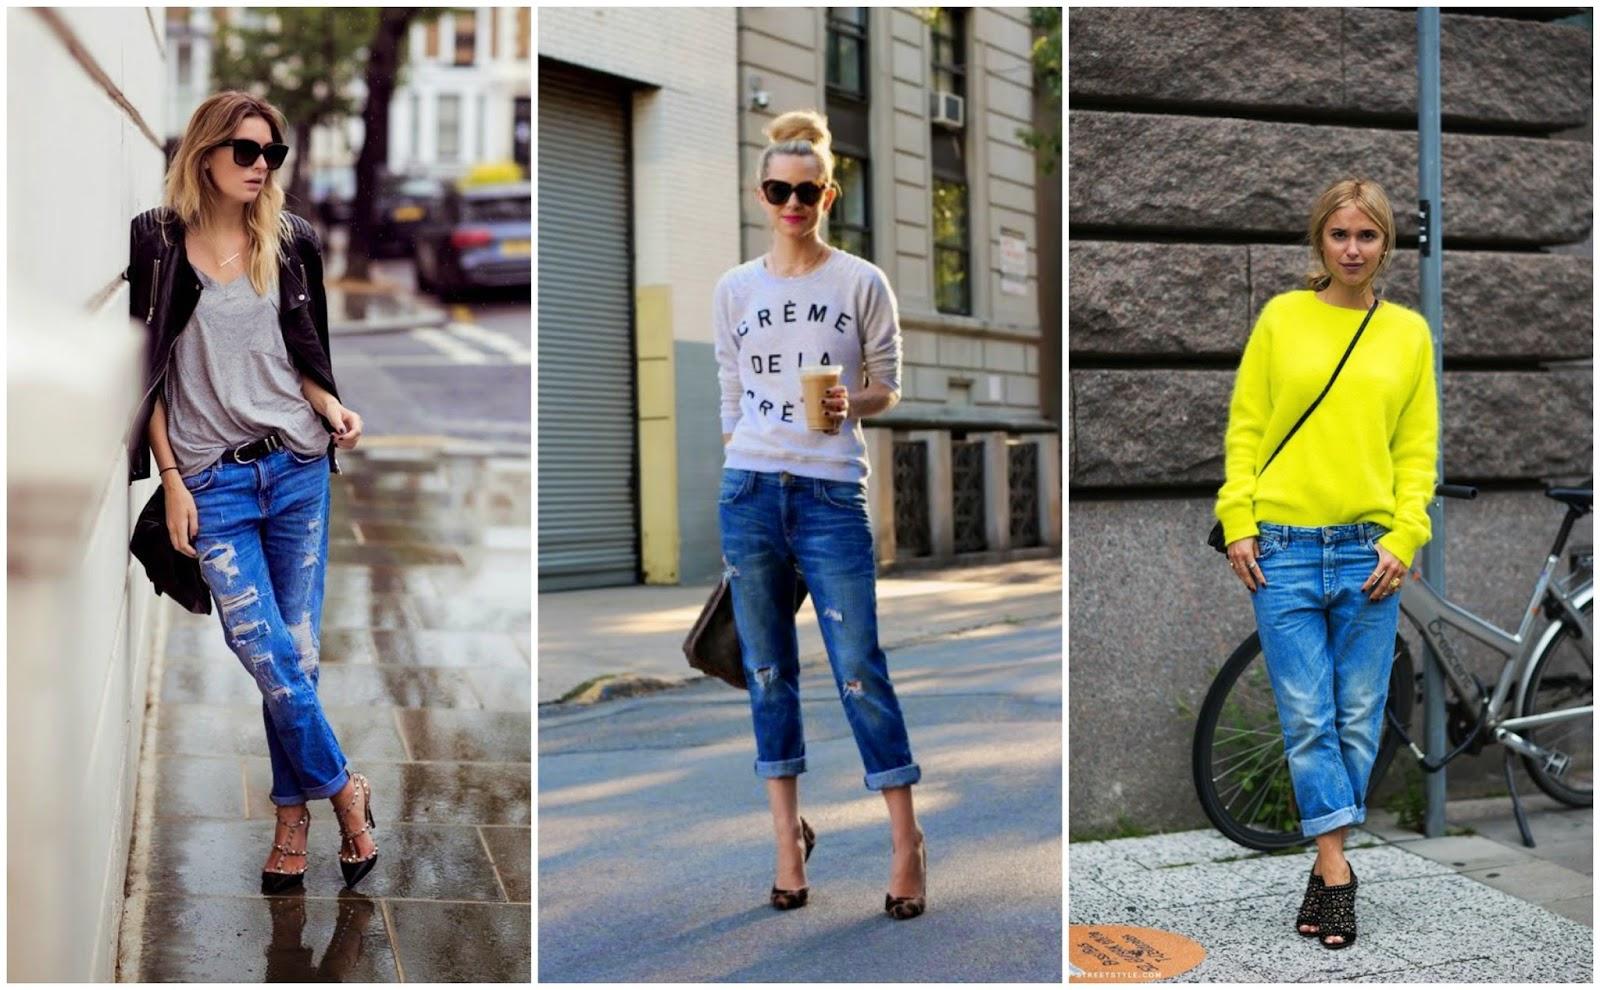 De Moda Usar Boyfriend JeansBlog Rica Como Costa uFcl5KJT13